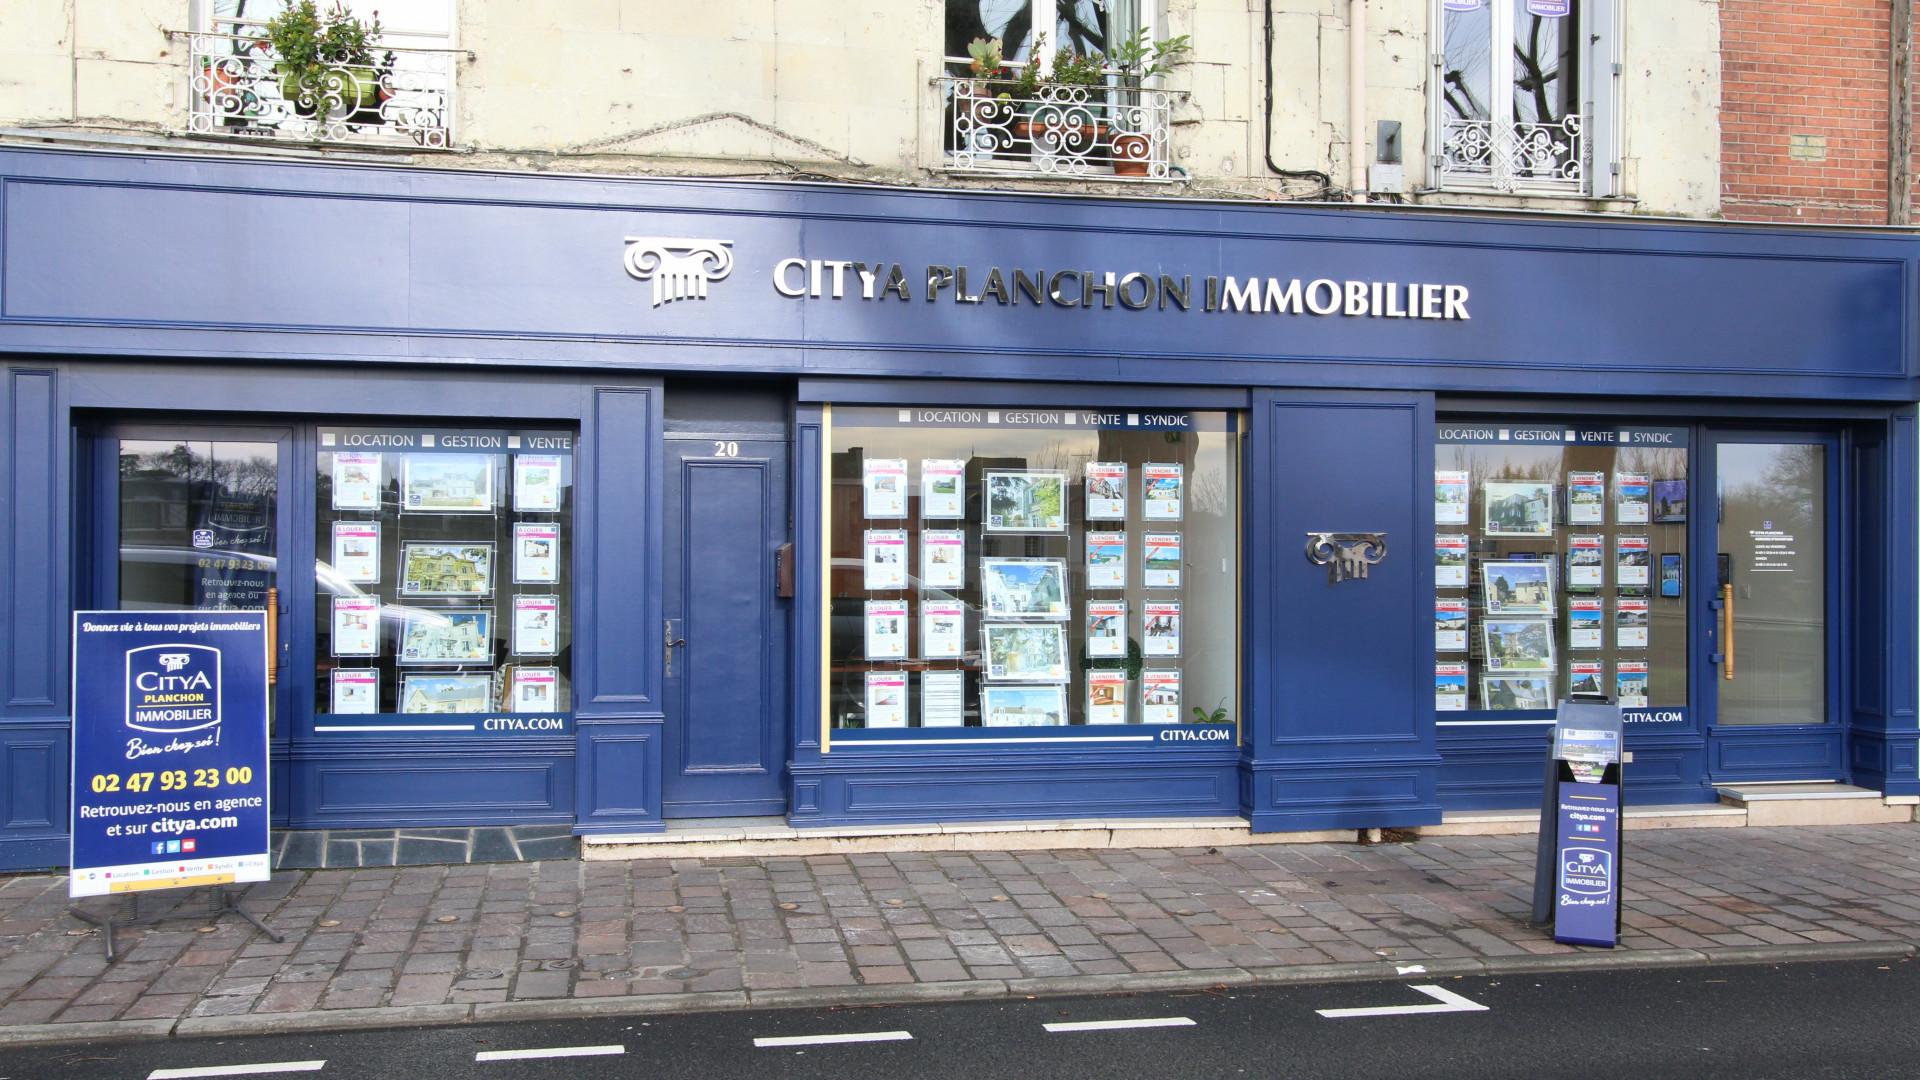 Photo de Citya Immobilier Planchon